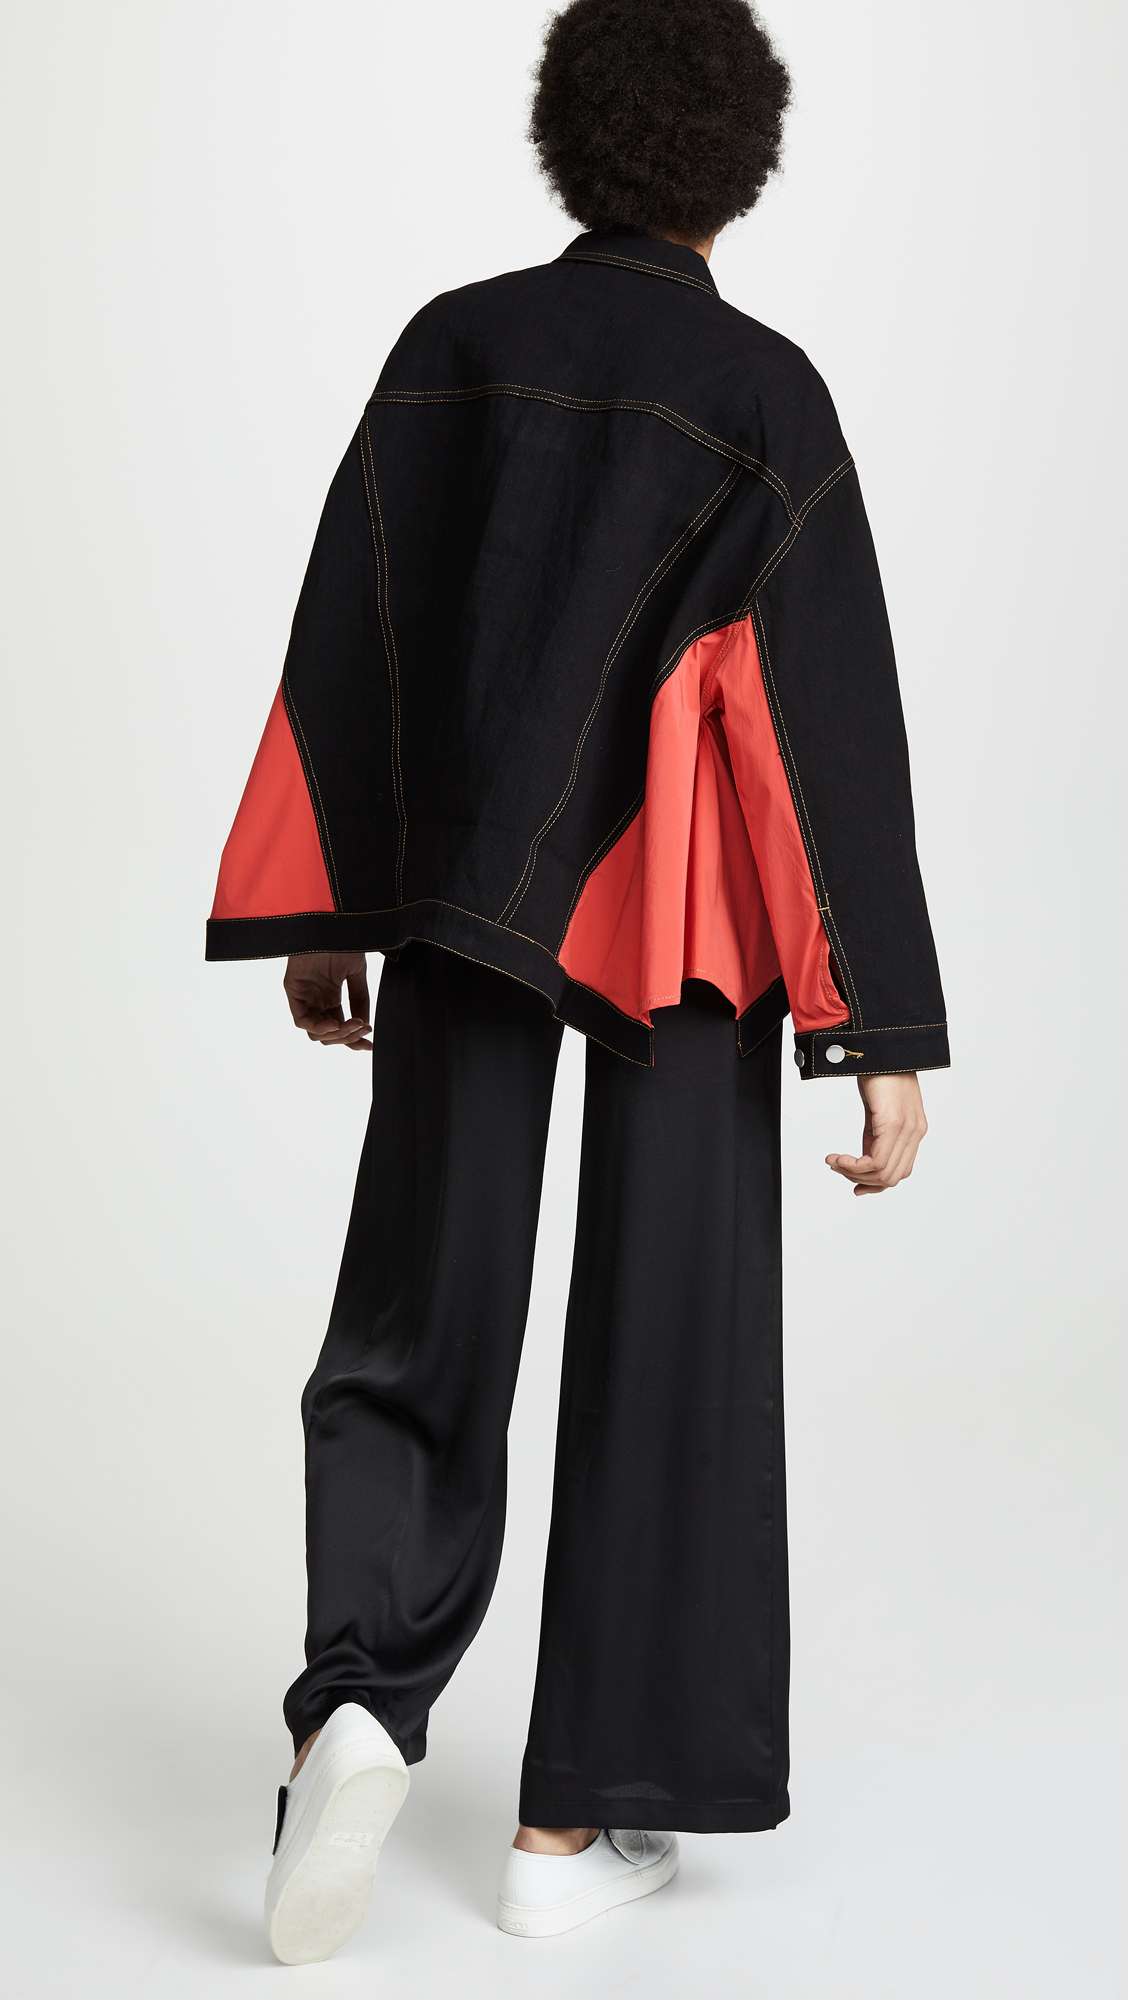 a7fab7808f Koche Oversized Jacket | SHOPBOP